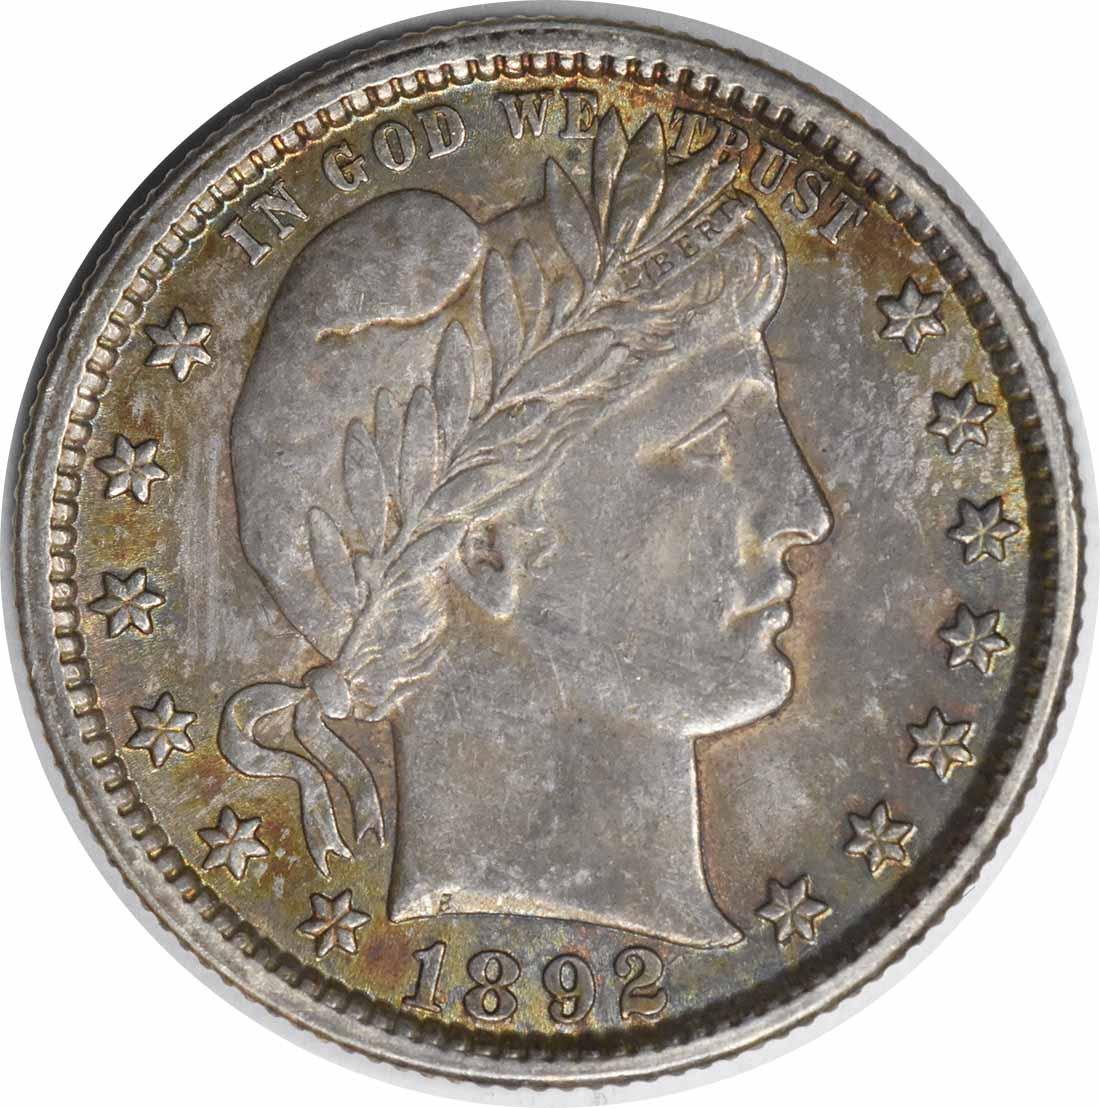 1892 Barber Silver Quarter TDO FS-101 MS63 Uncertified #1131